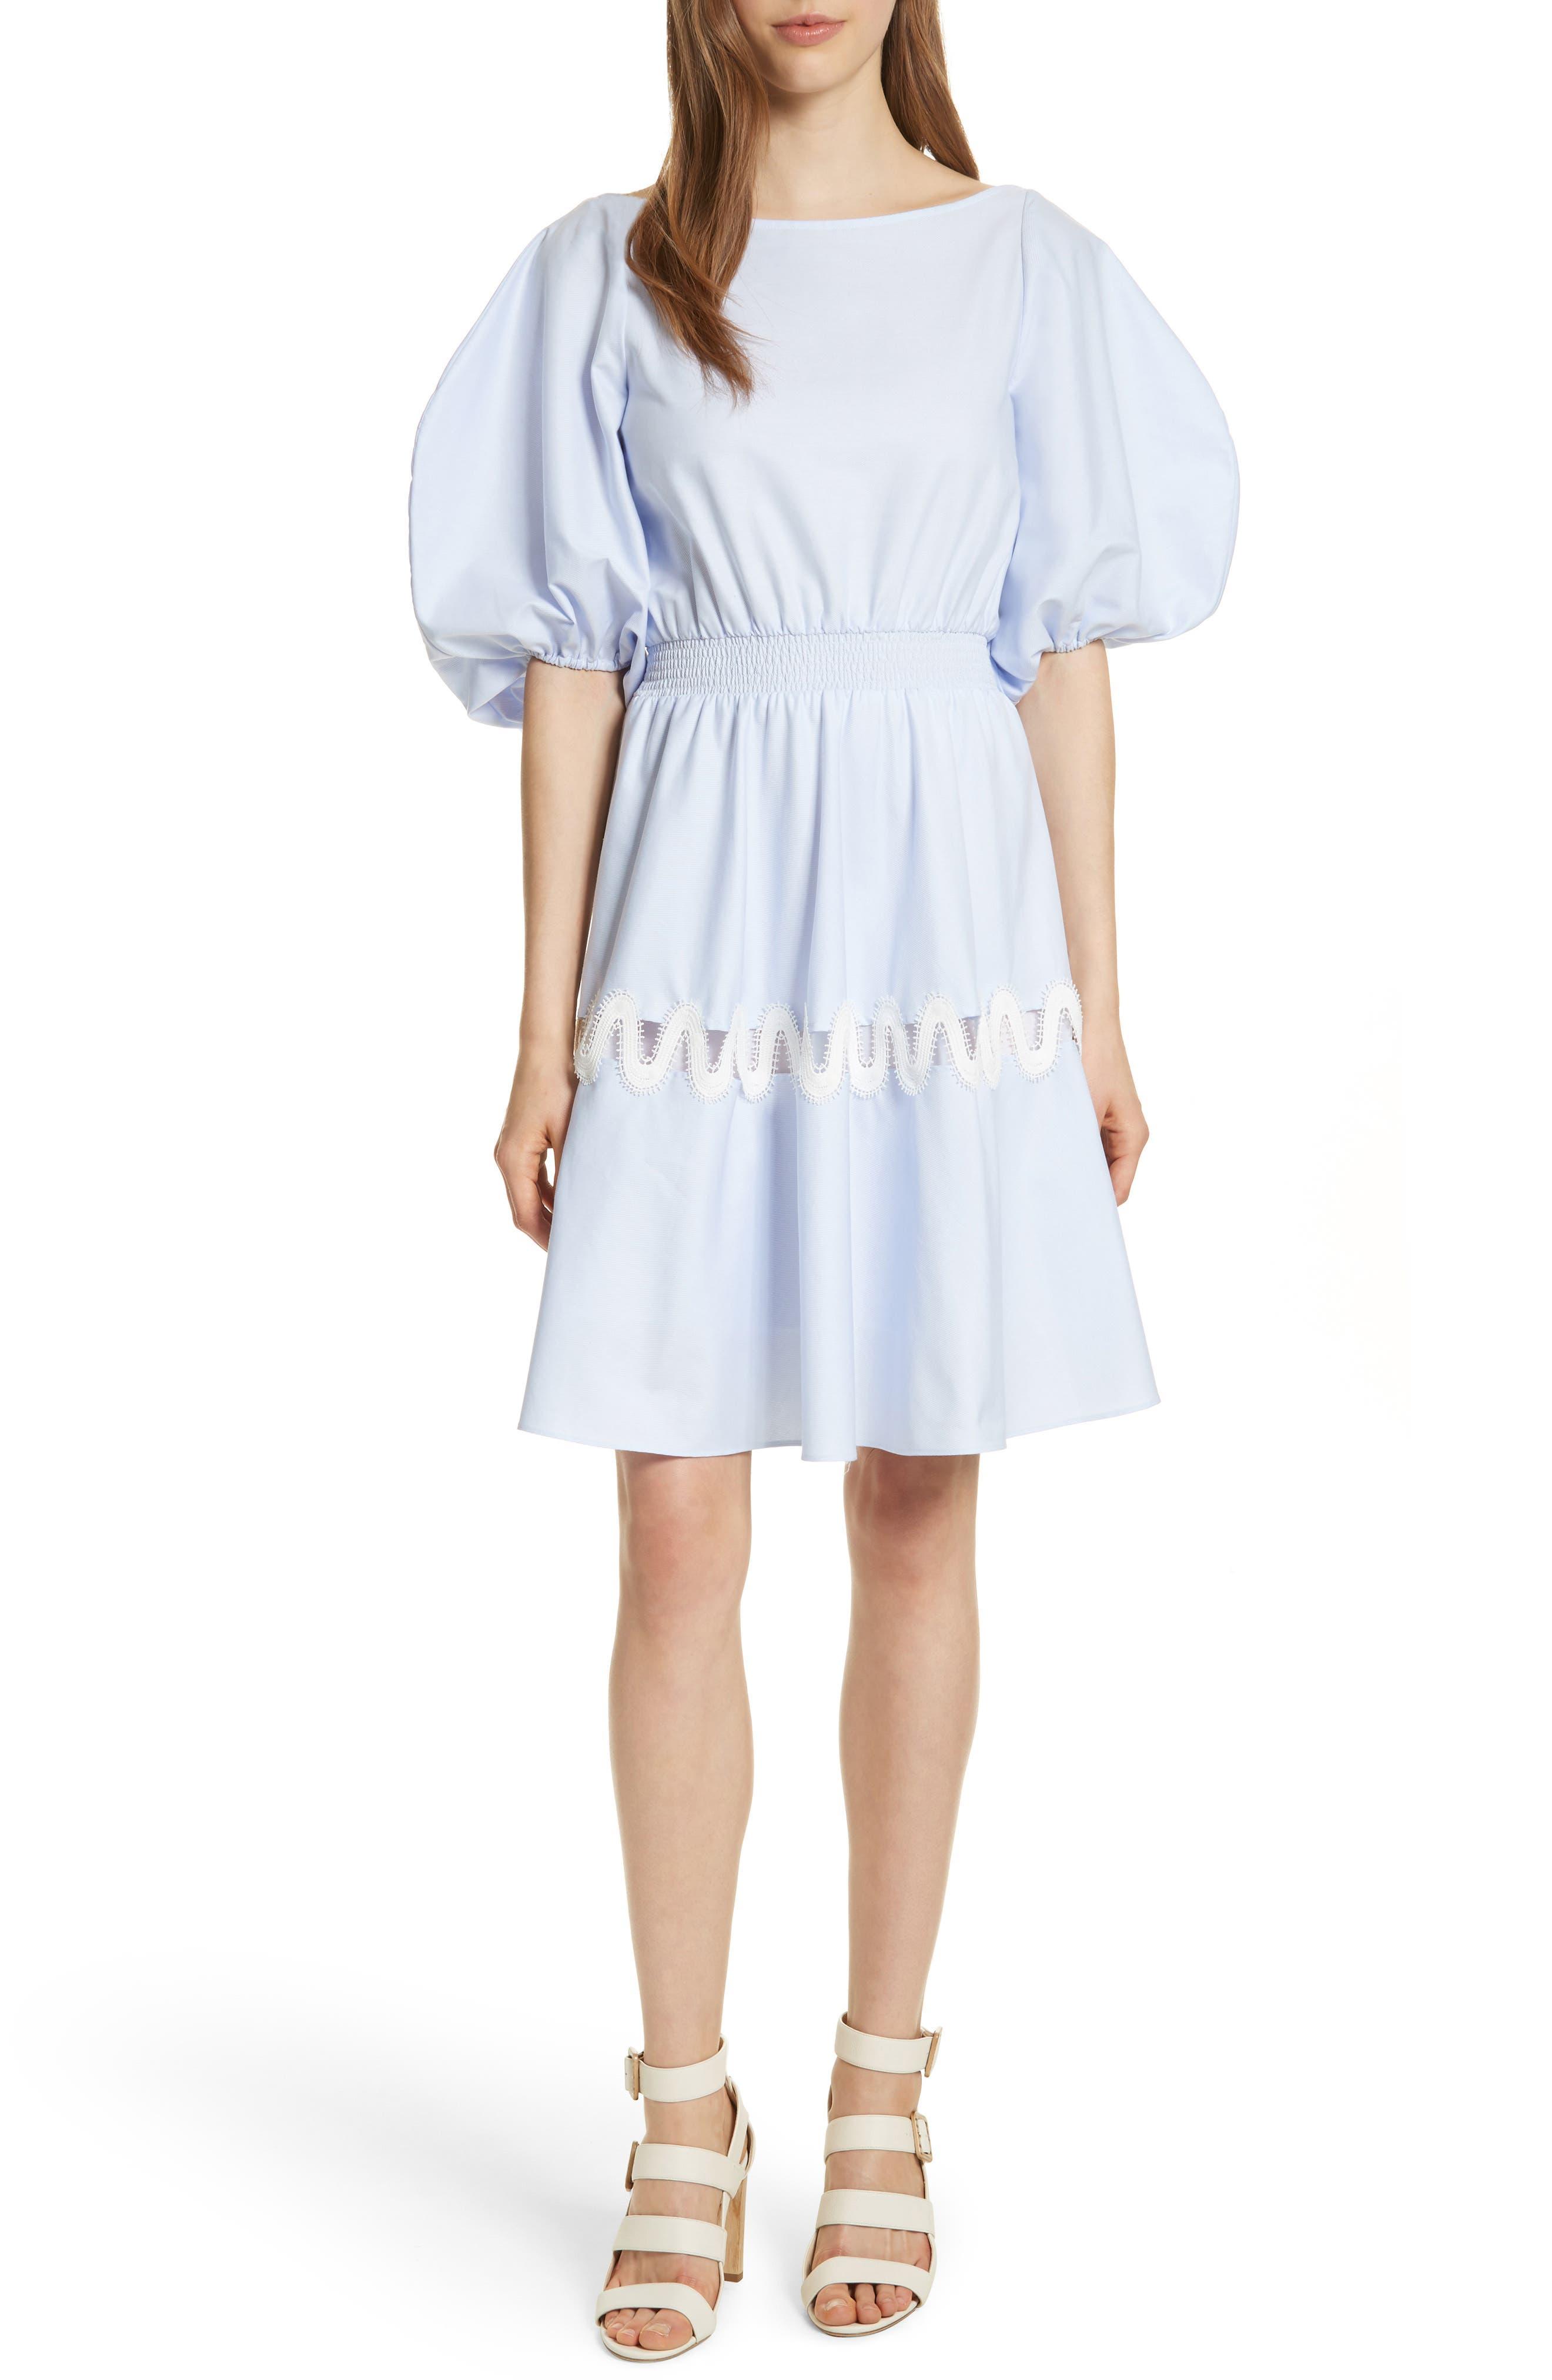 Prose & Poetry Charleene Cotton Balloon Sleeve Dress,                             Main thumbnail 1, color,